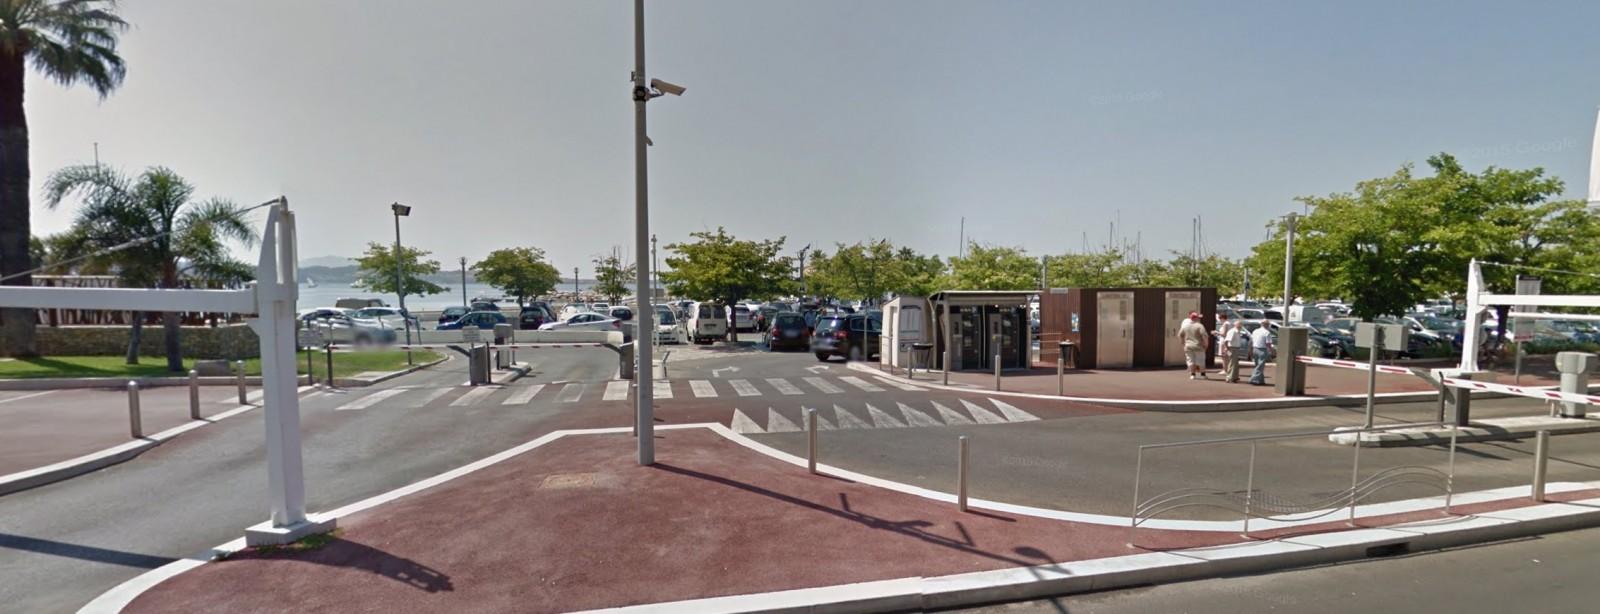 Parking central